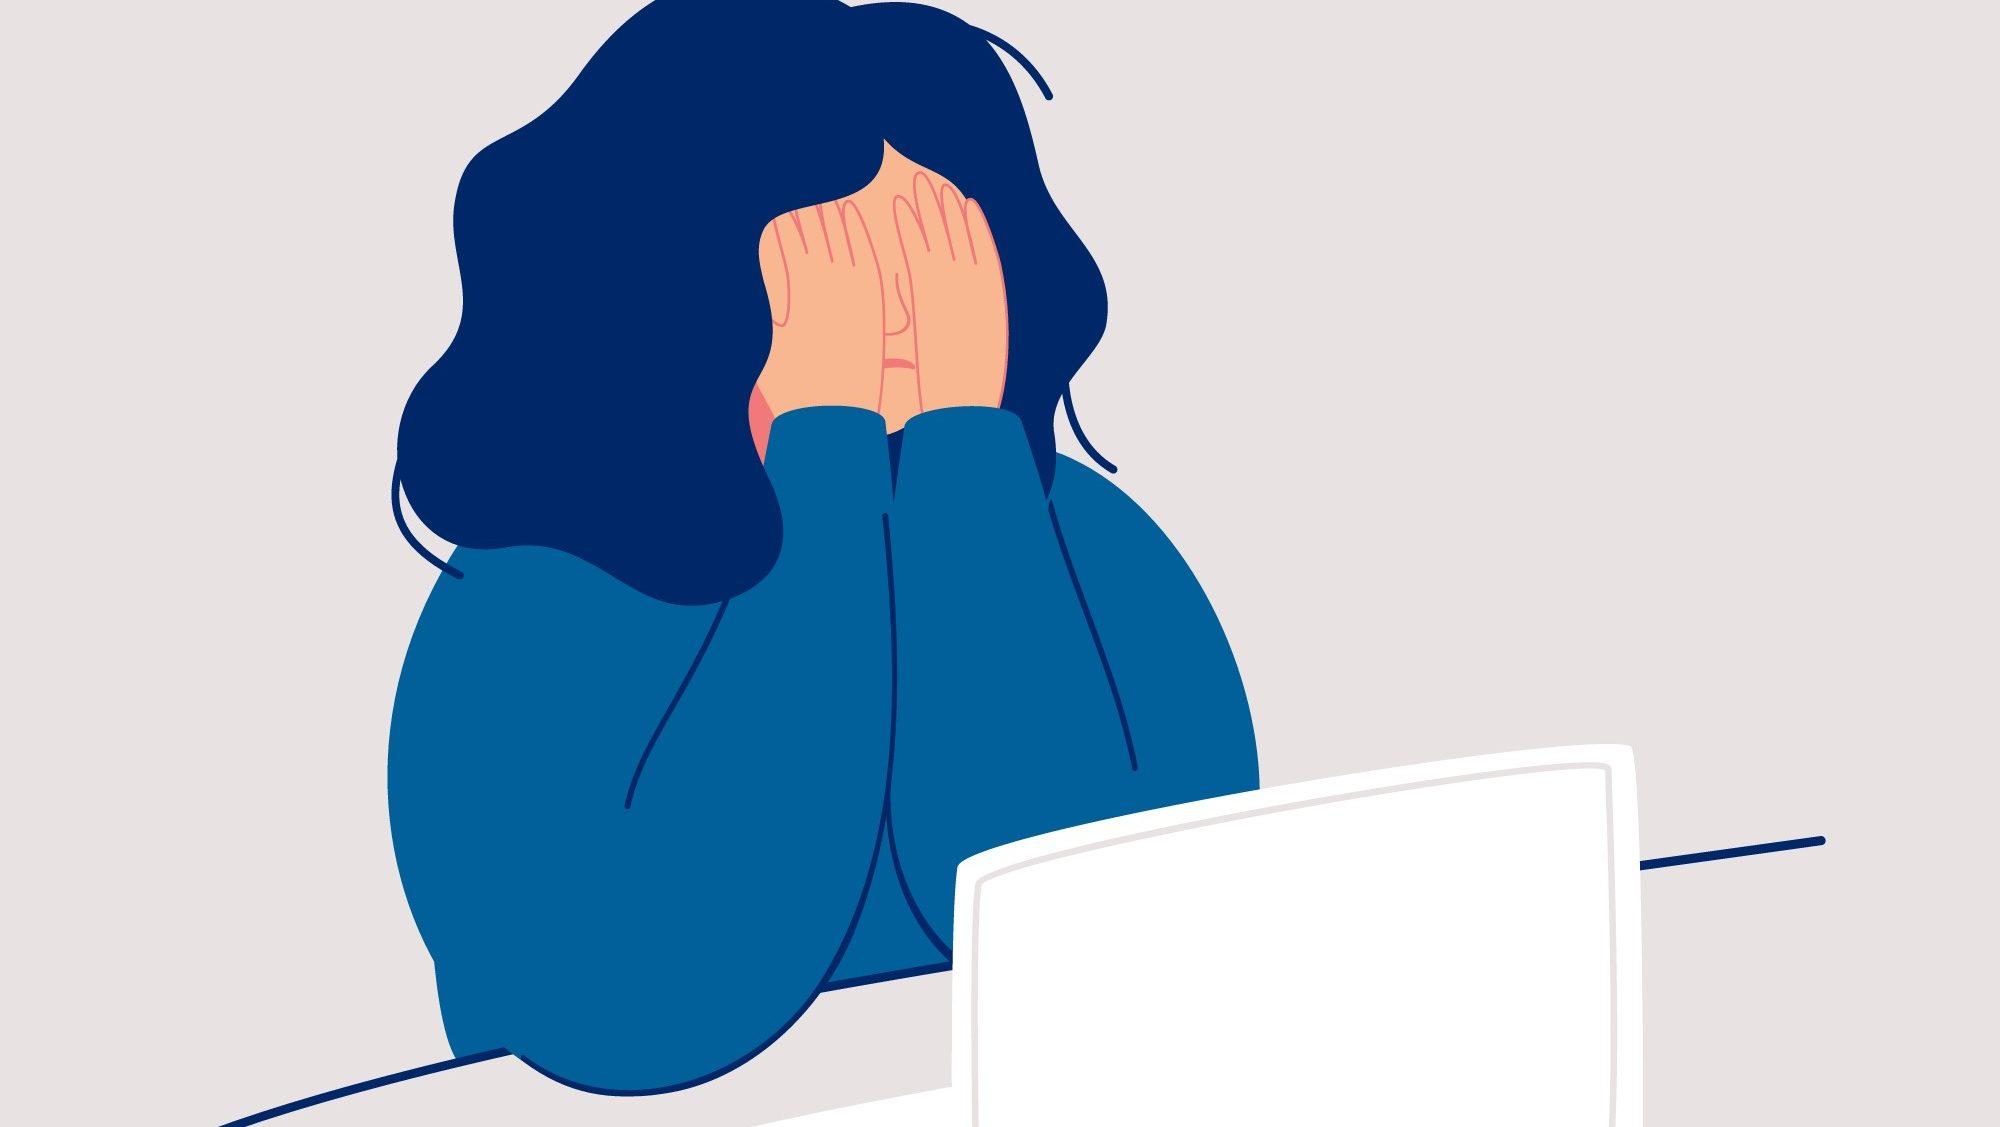 social media negatively impacting mental health